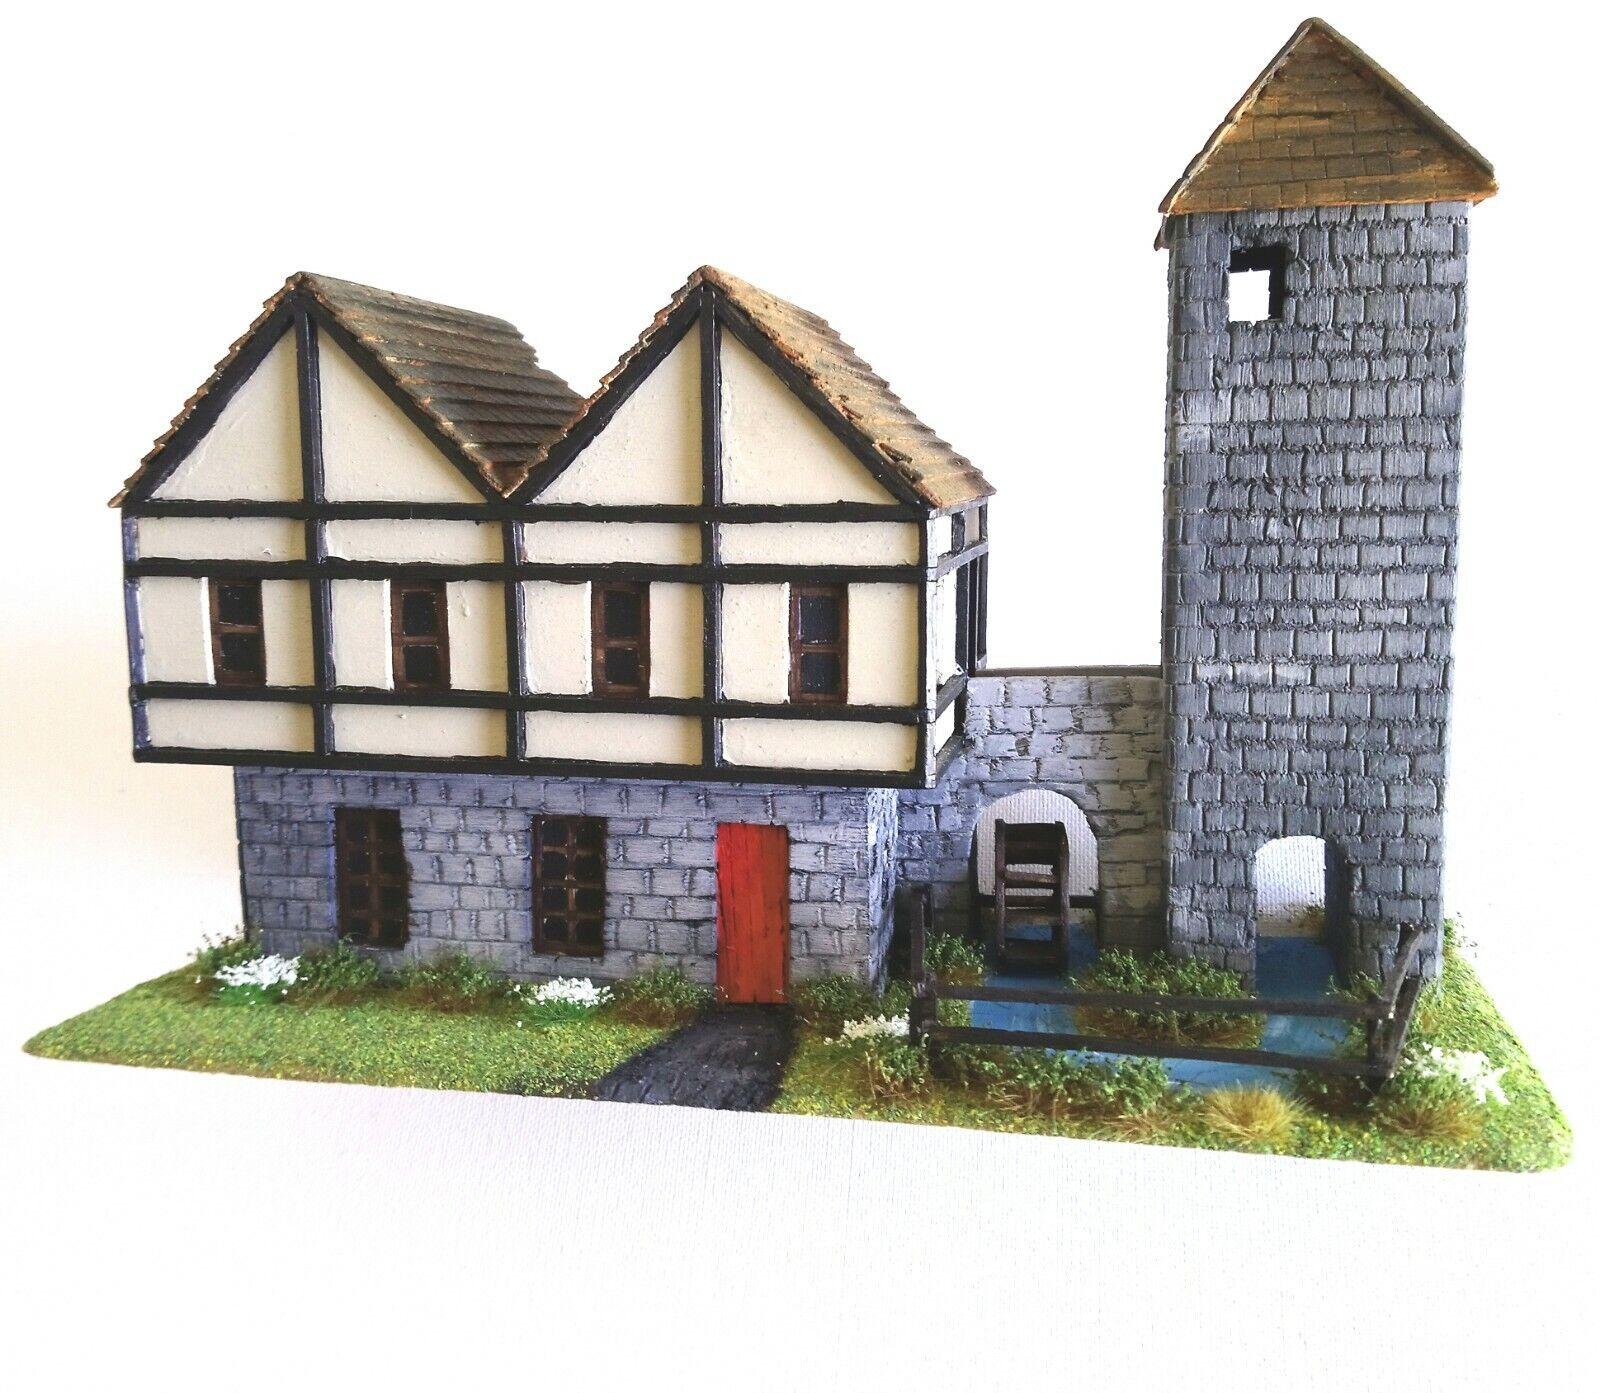 Paisaje Pintado A casa edificio Molino warJuego Modelo wargaming Juegos De Mesa